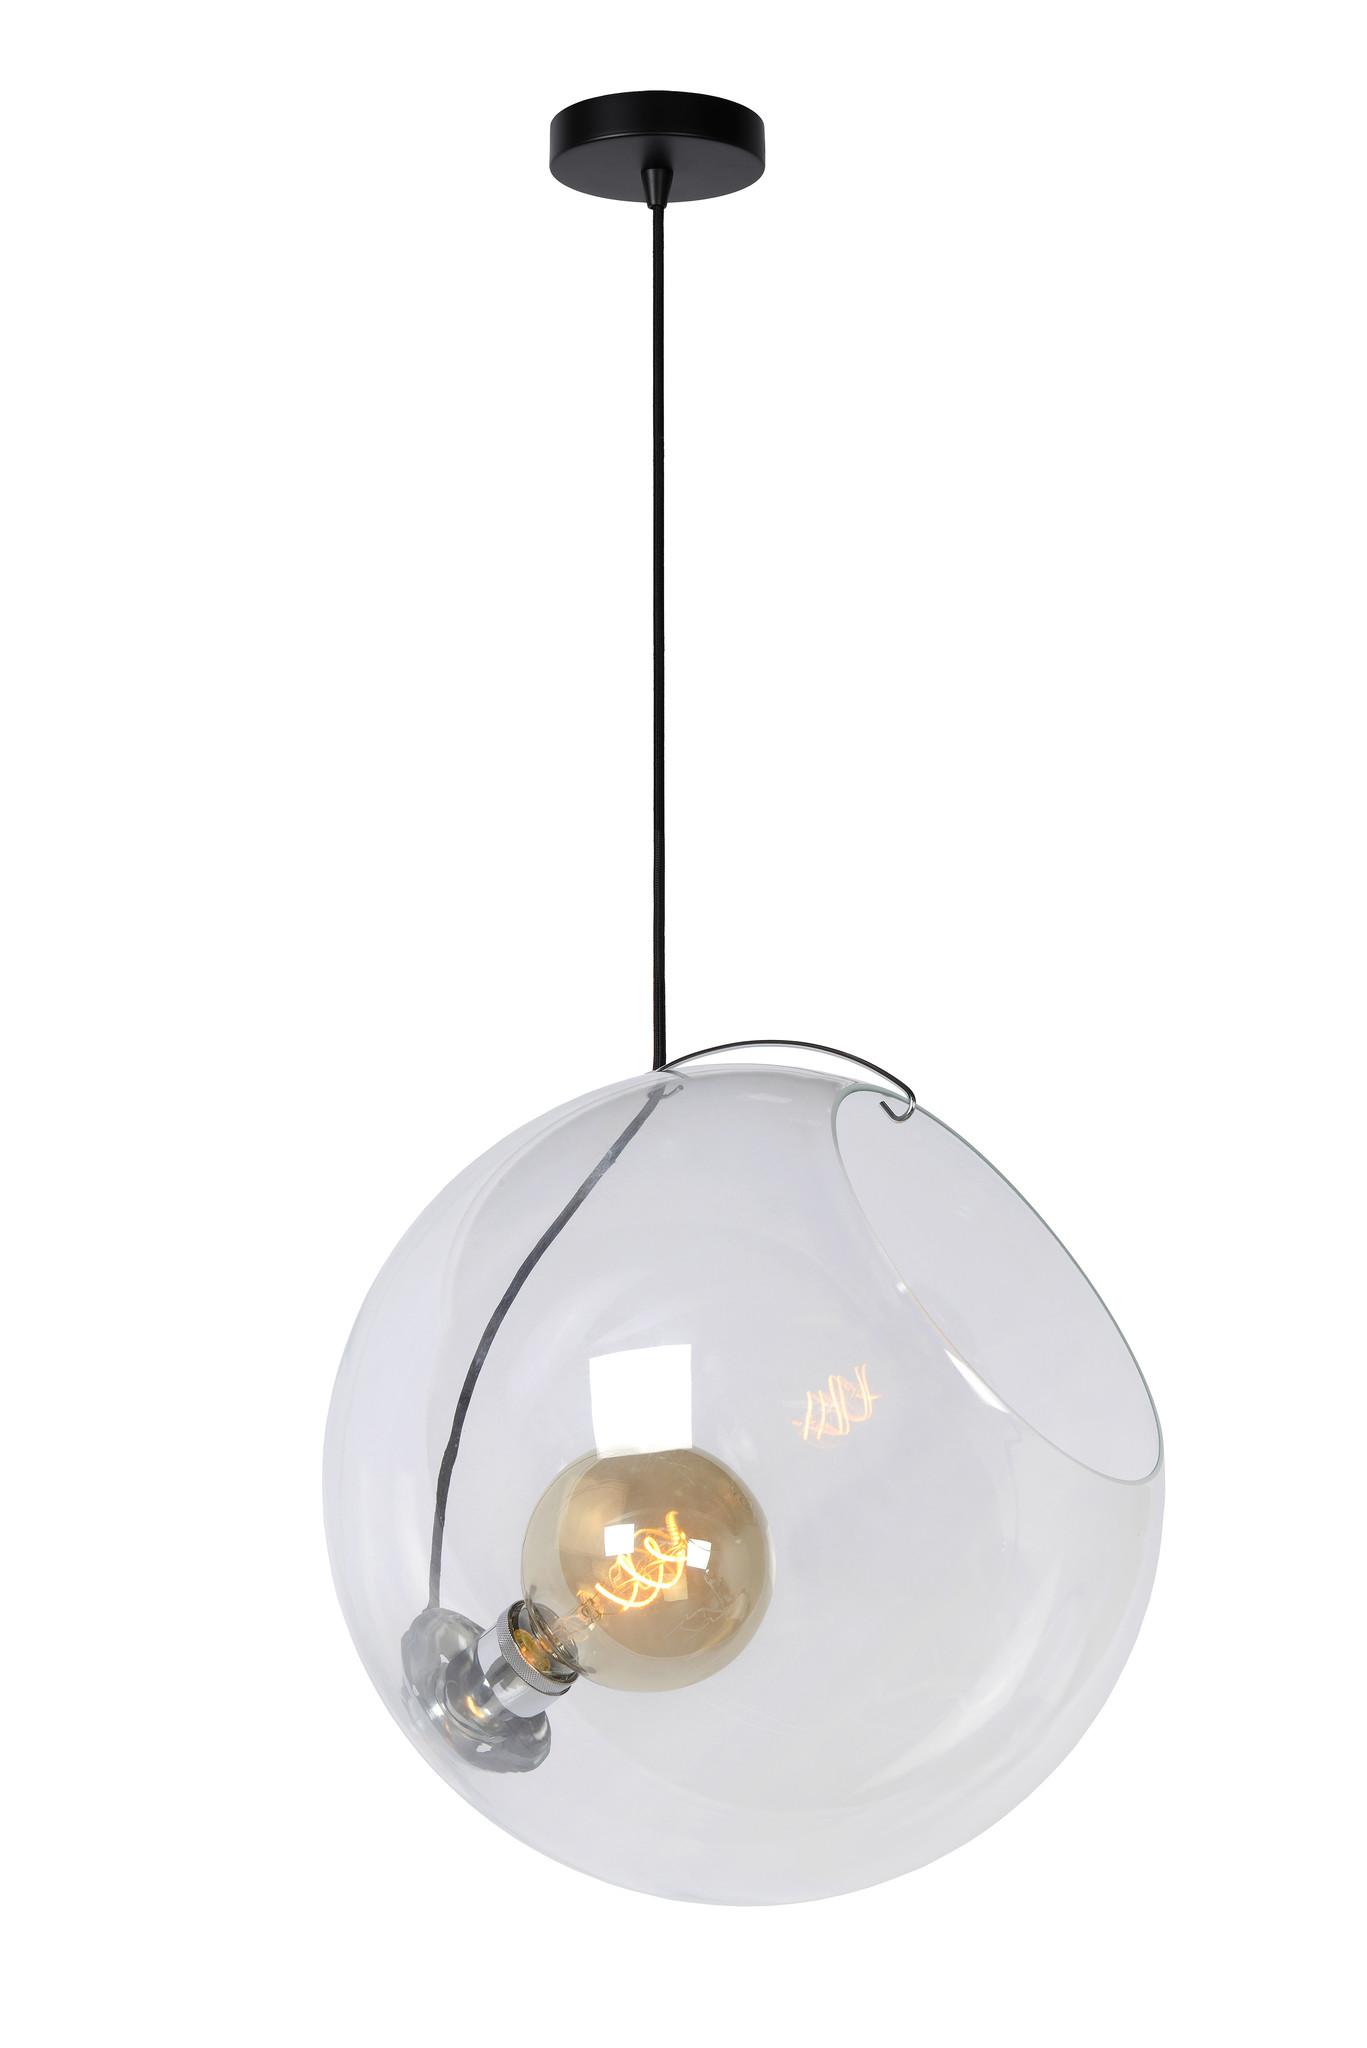 Lucide JAZZLYNN Hanglamp-Transp.-Ø40-1xE27-60W-Glas